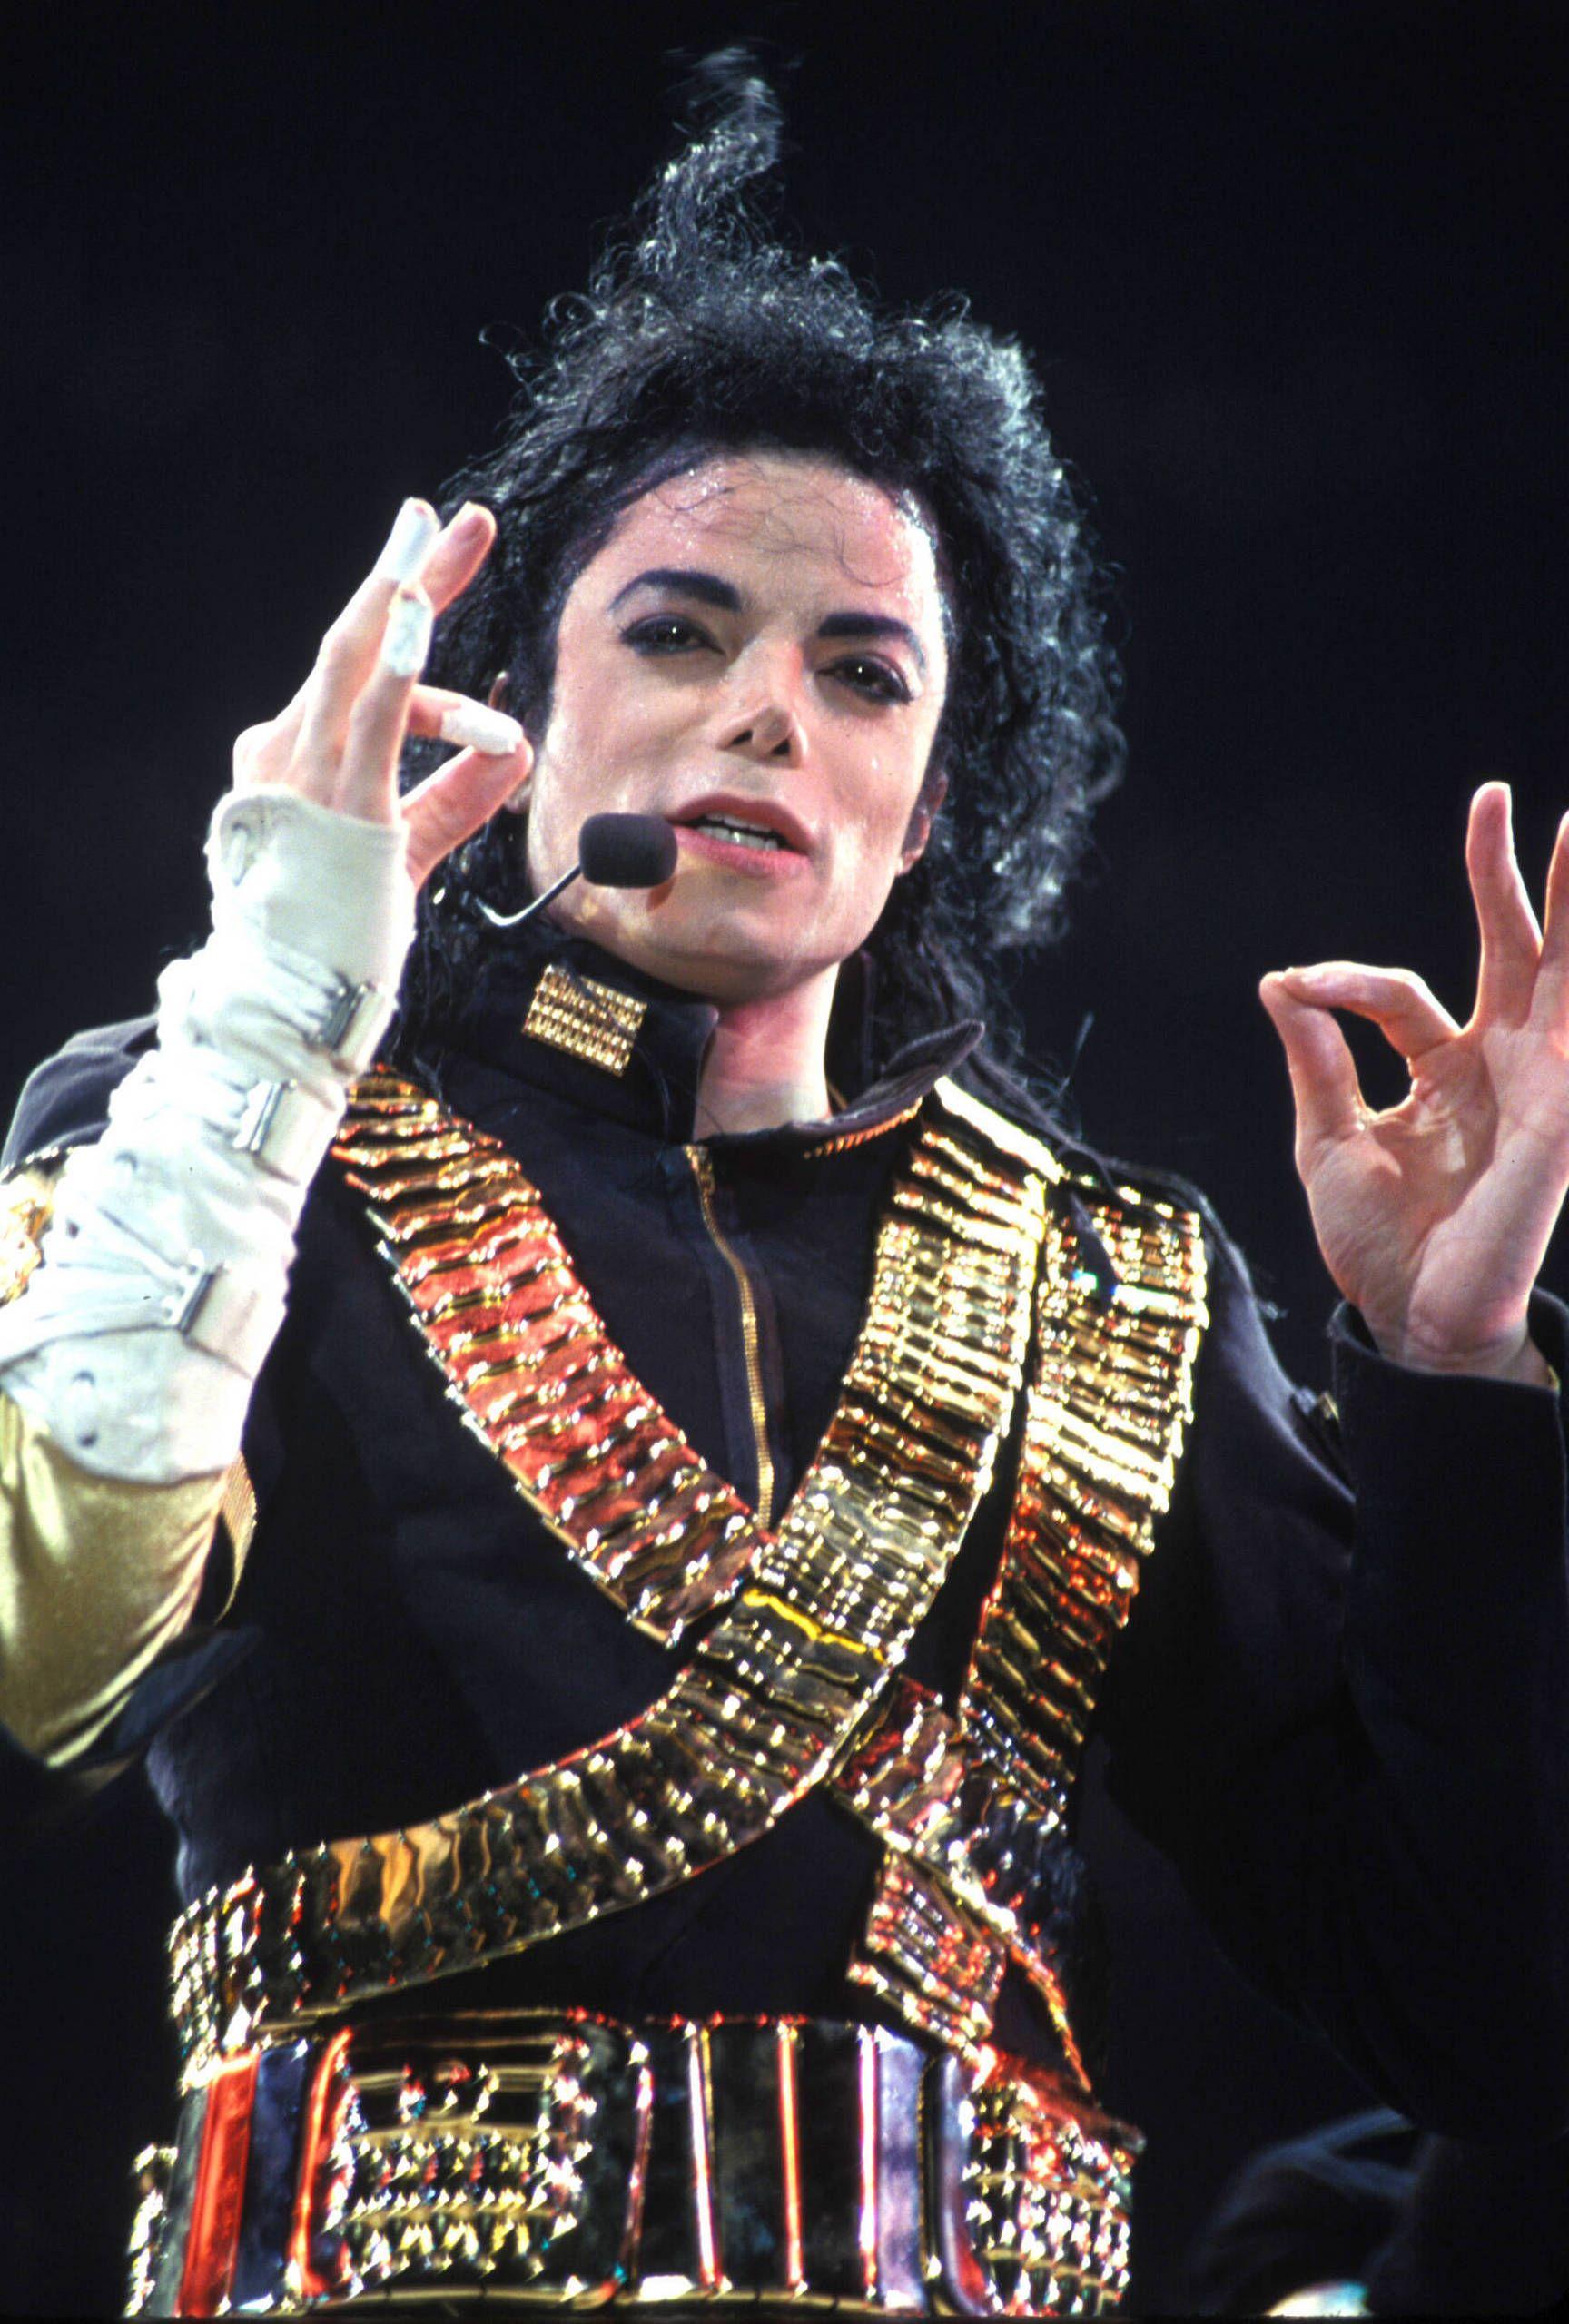 MICHAEL-michael-jackson-concerts-12663666-1728-2560.jpg ...